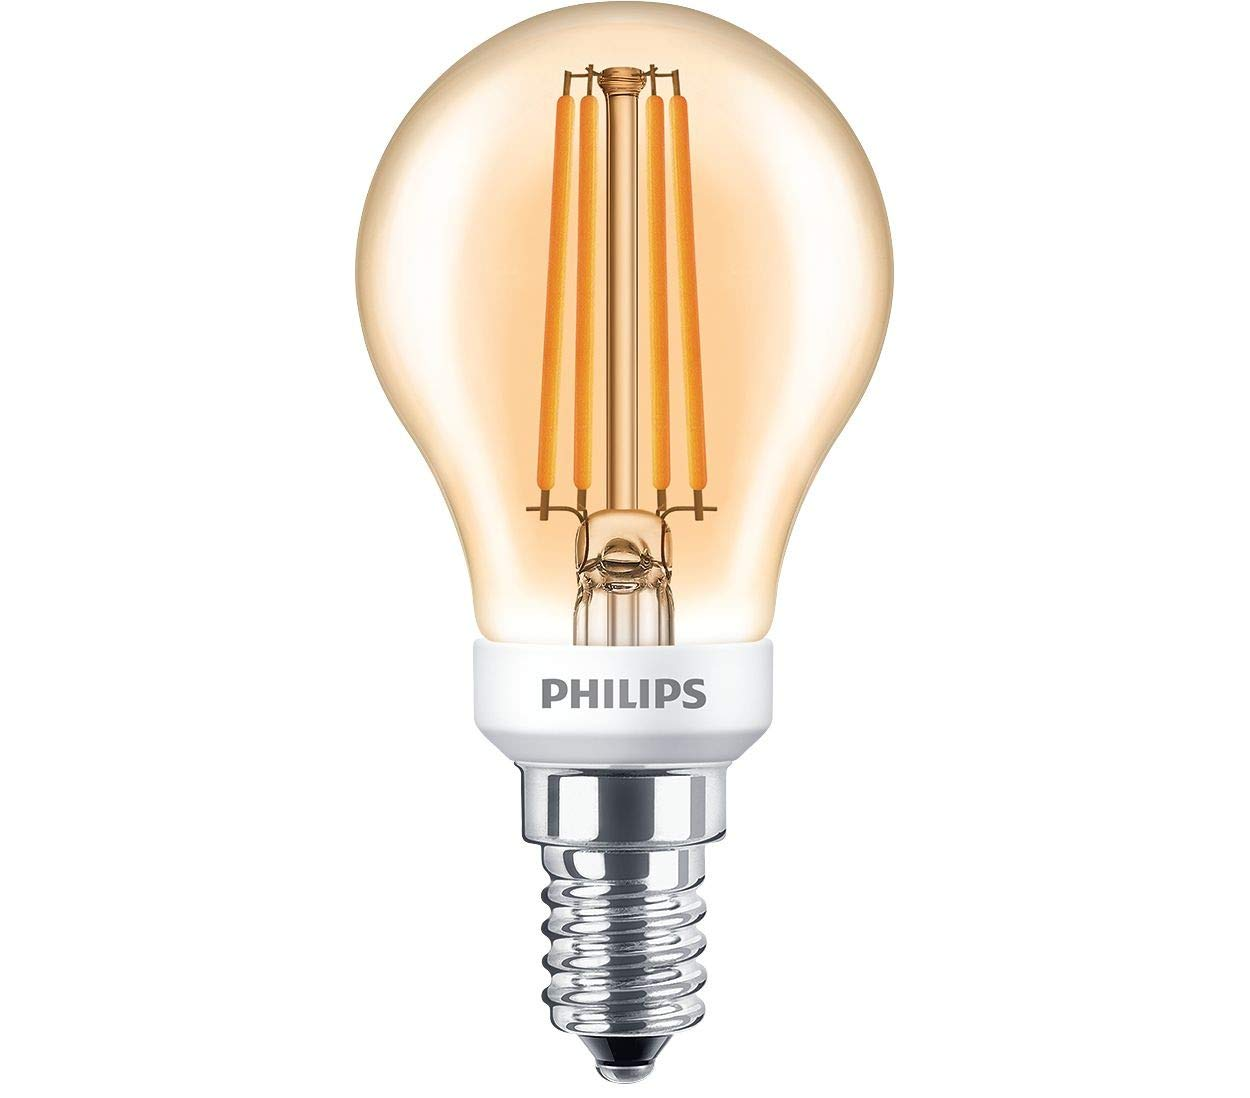 Philips Bombilla LED Gota filamento 5 W E14 827 2700 Kelvin A60 Oro transparente blanco cálido extra: Amazon.es: Electrónica